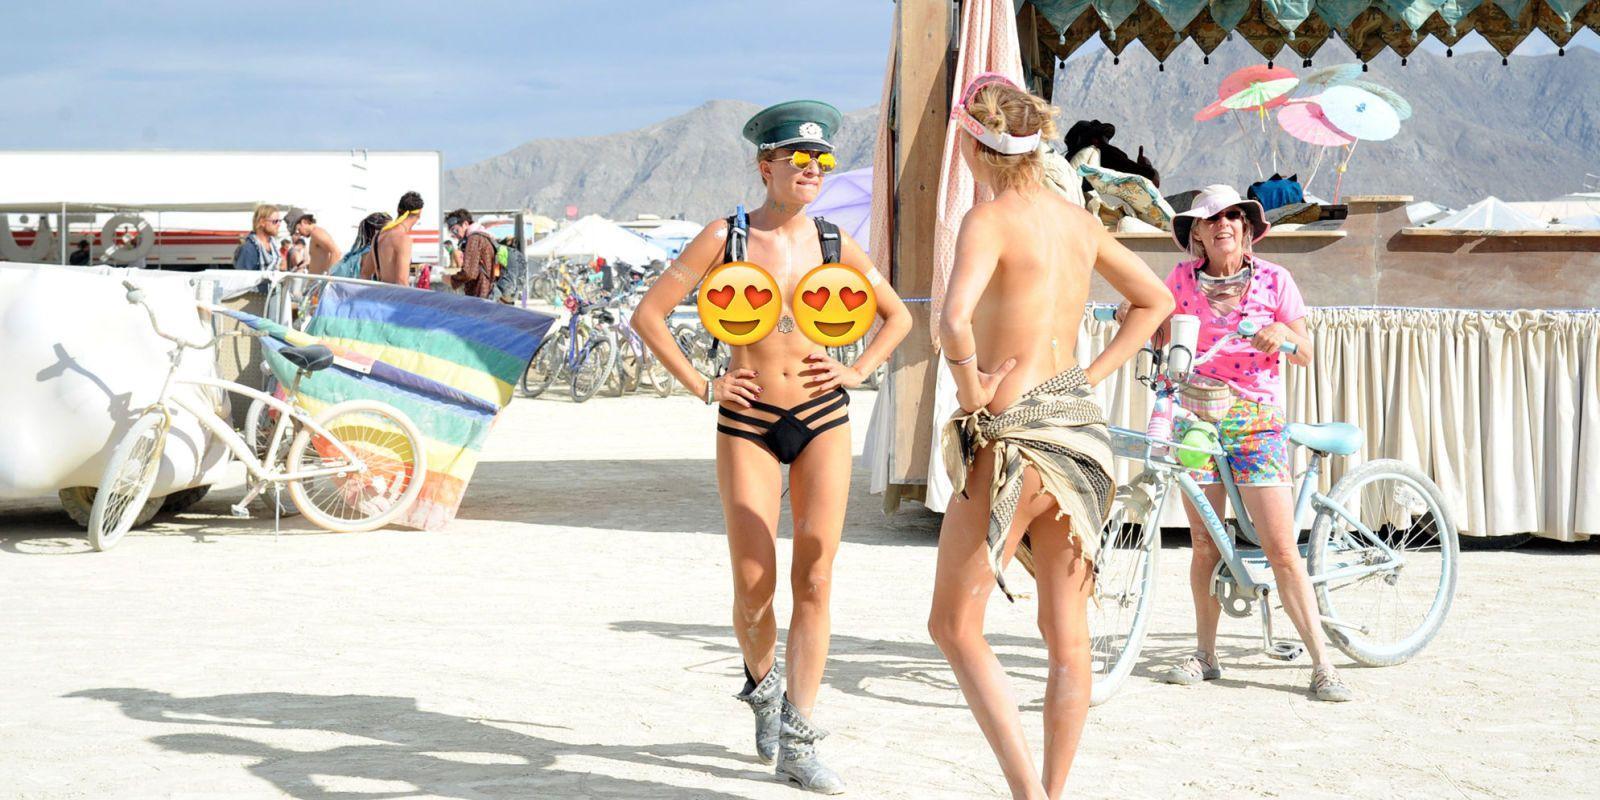 Burning man girl naked photos 630